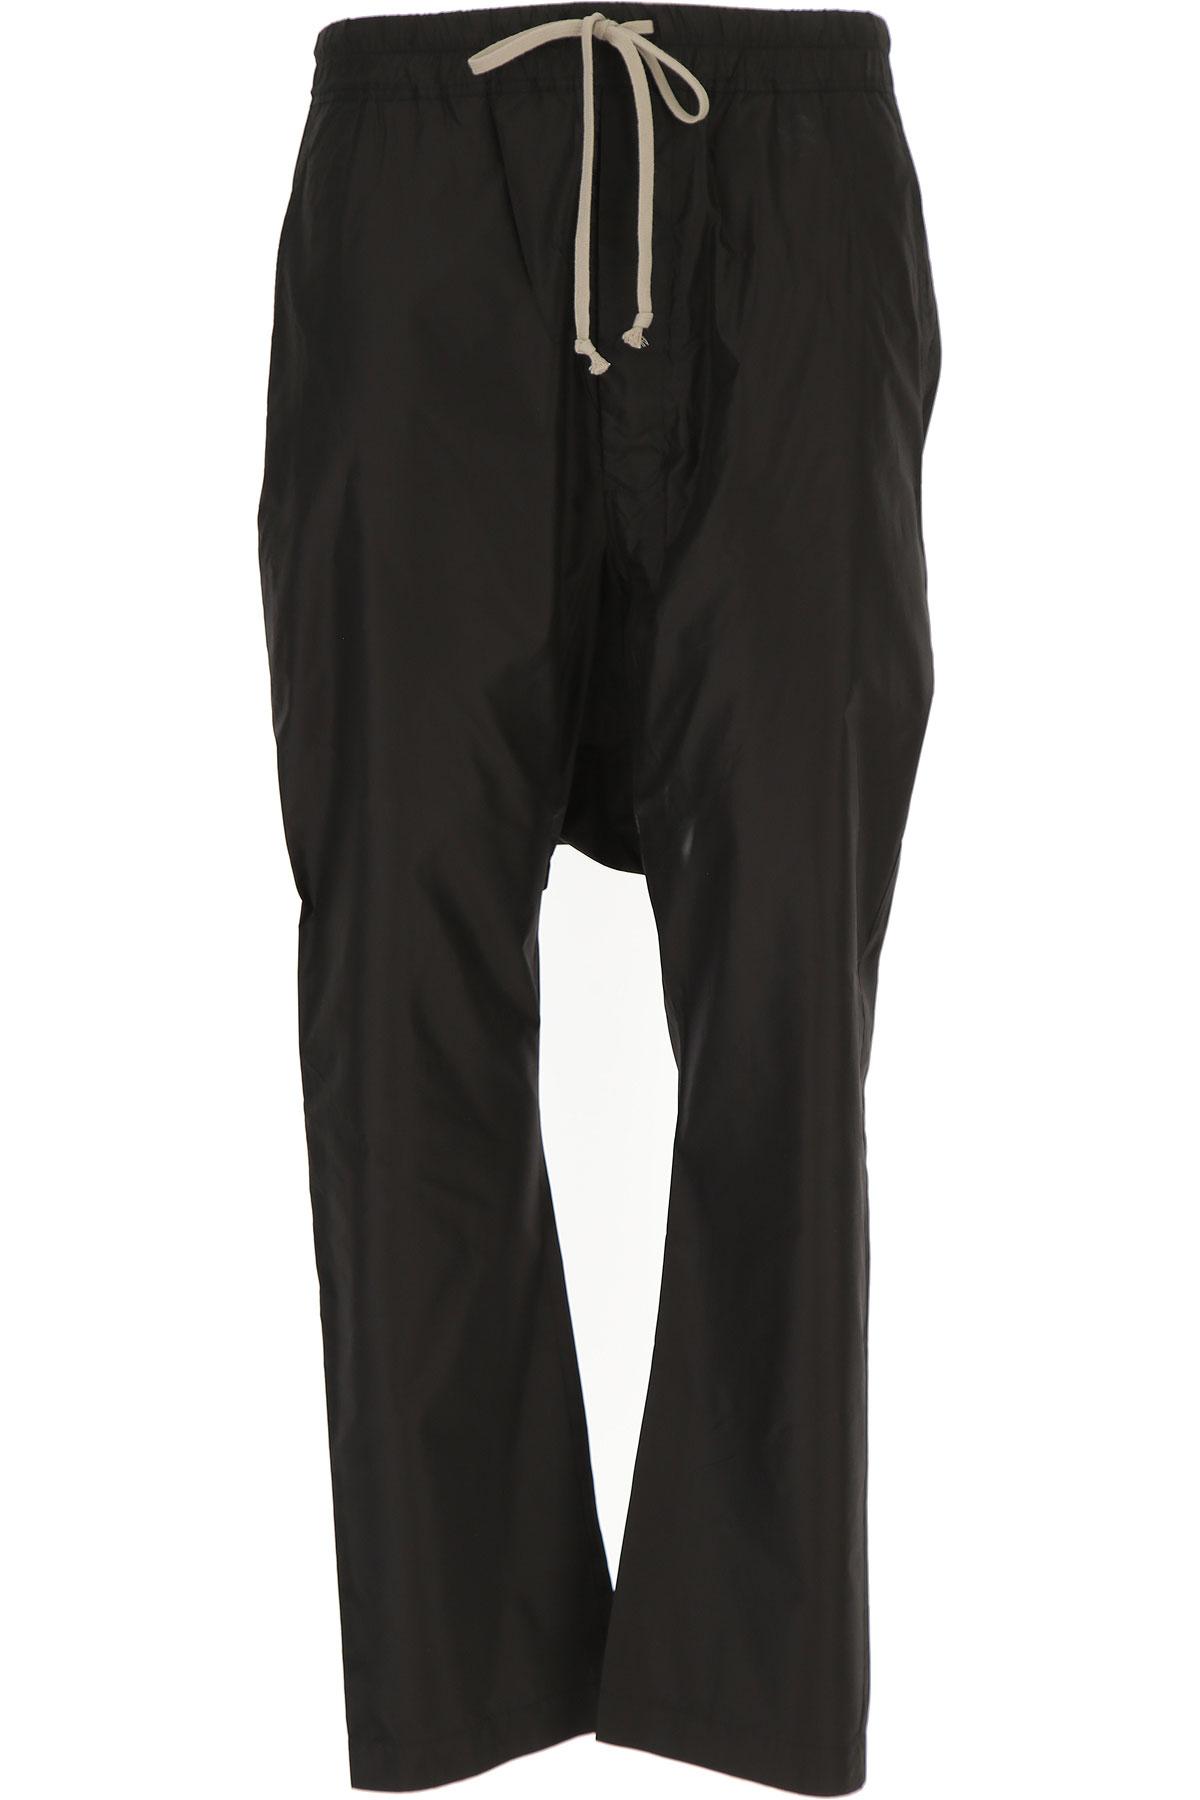 Rick Owens Pants for Men On Sale in Outlet, Black, Silk, 2019, 32 34 36